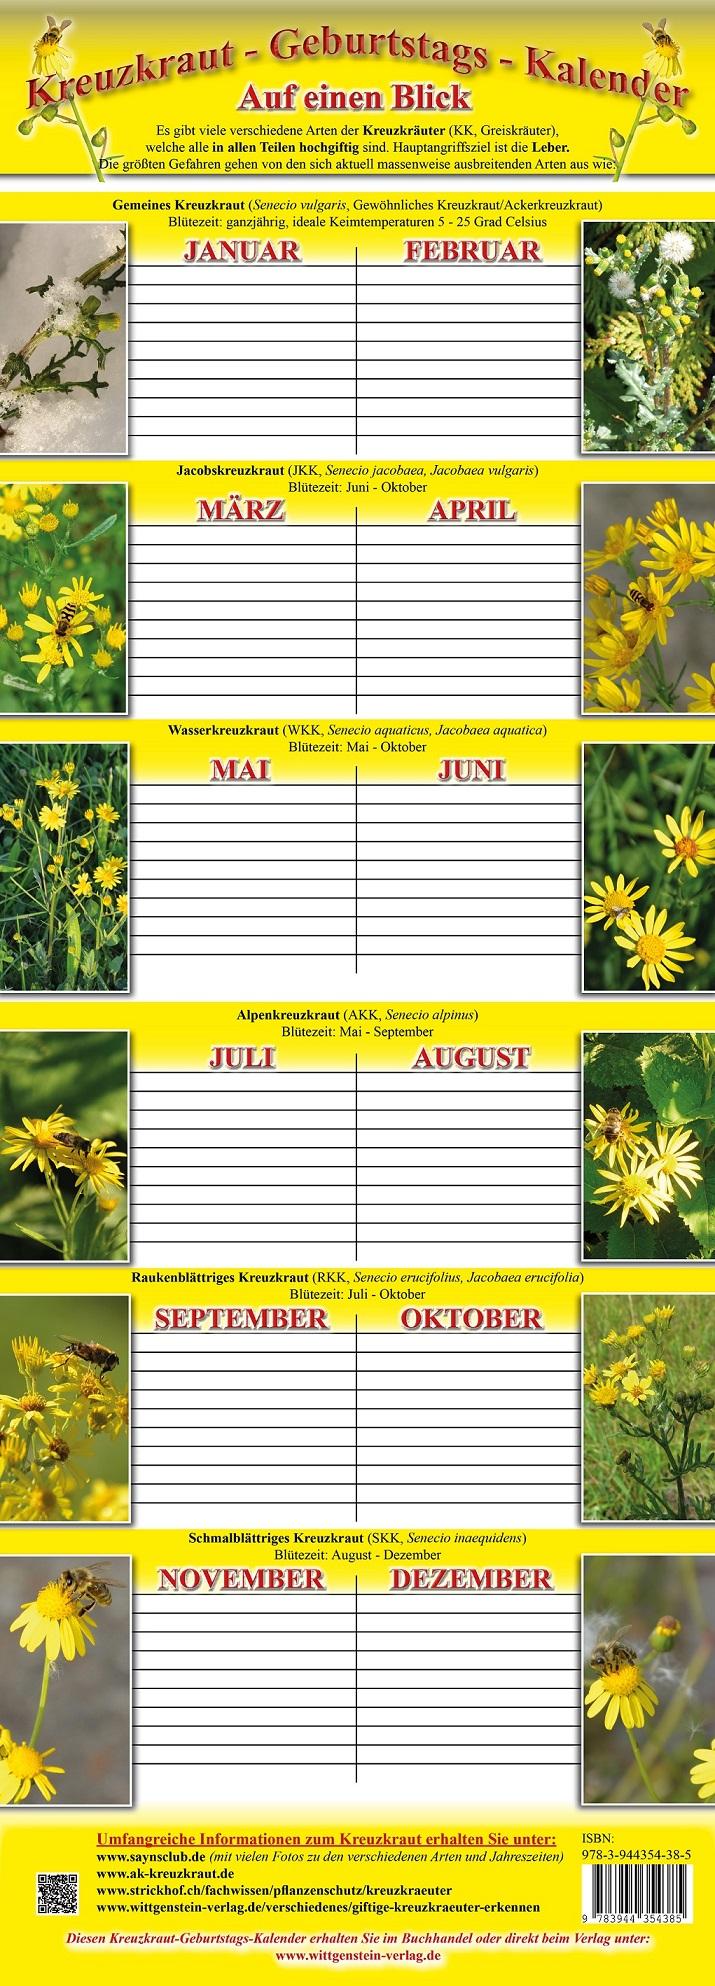 Kreuzkraut Kalender